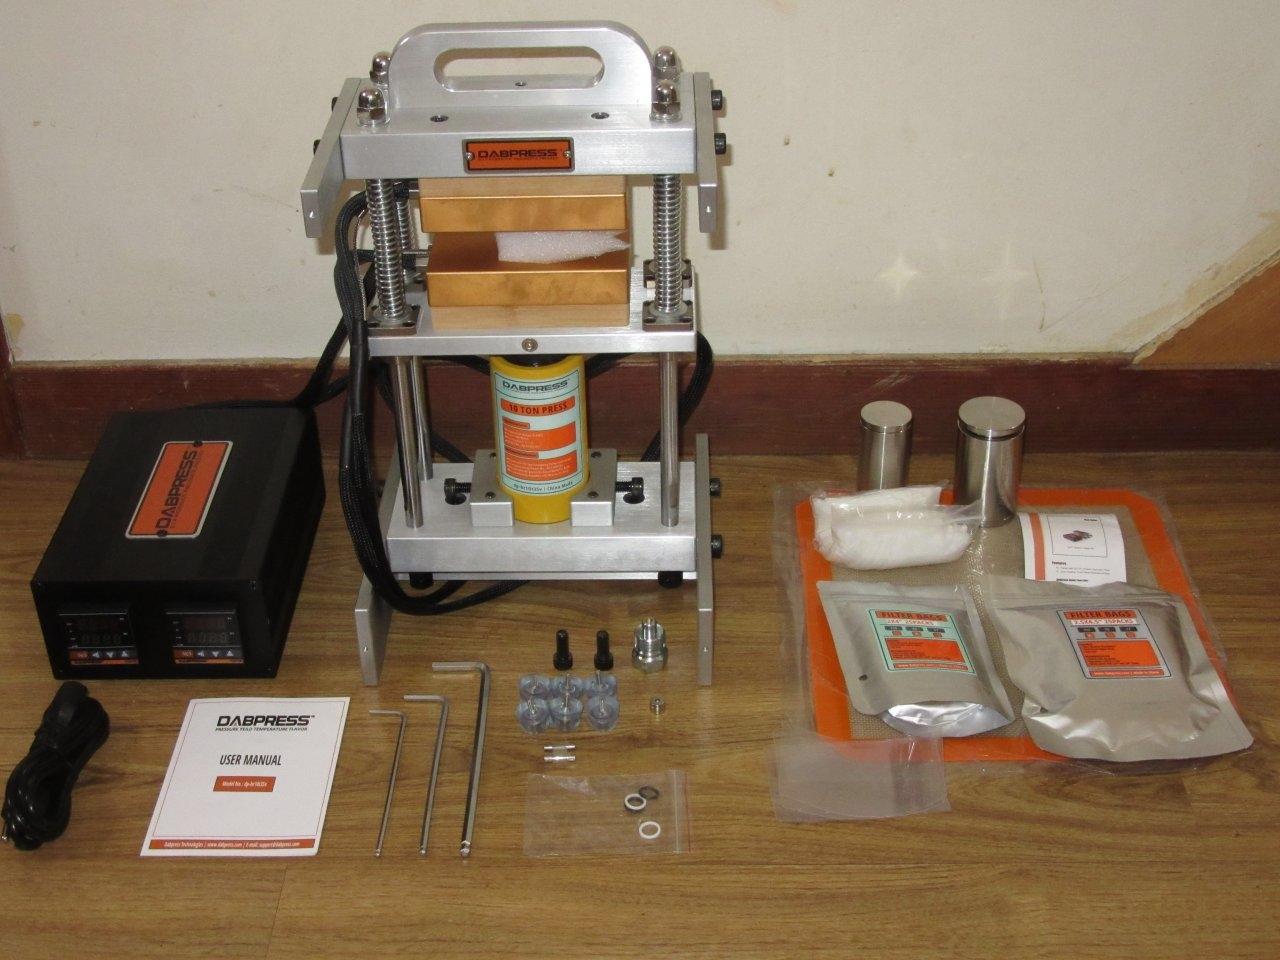 Dabpress dp-hr10t35v 10-Ton Portable Tabletop Driptech Hydraulic